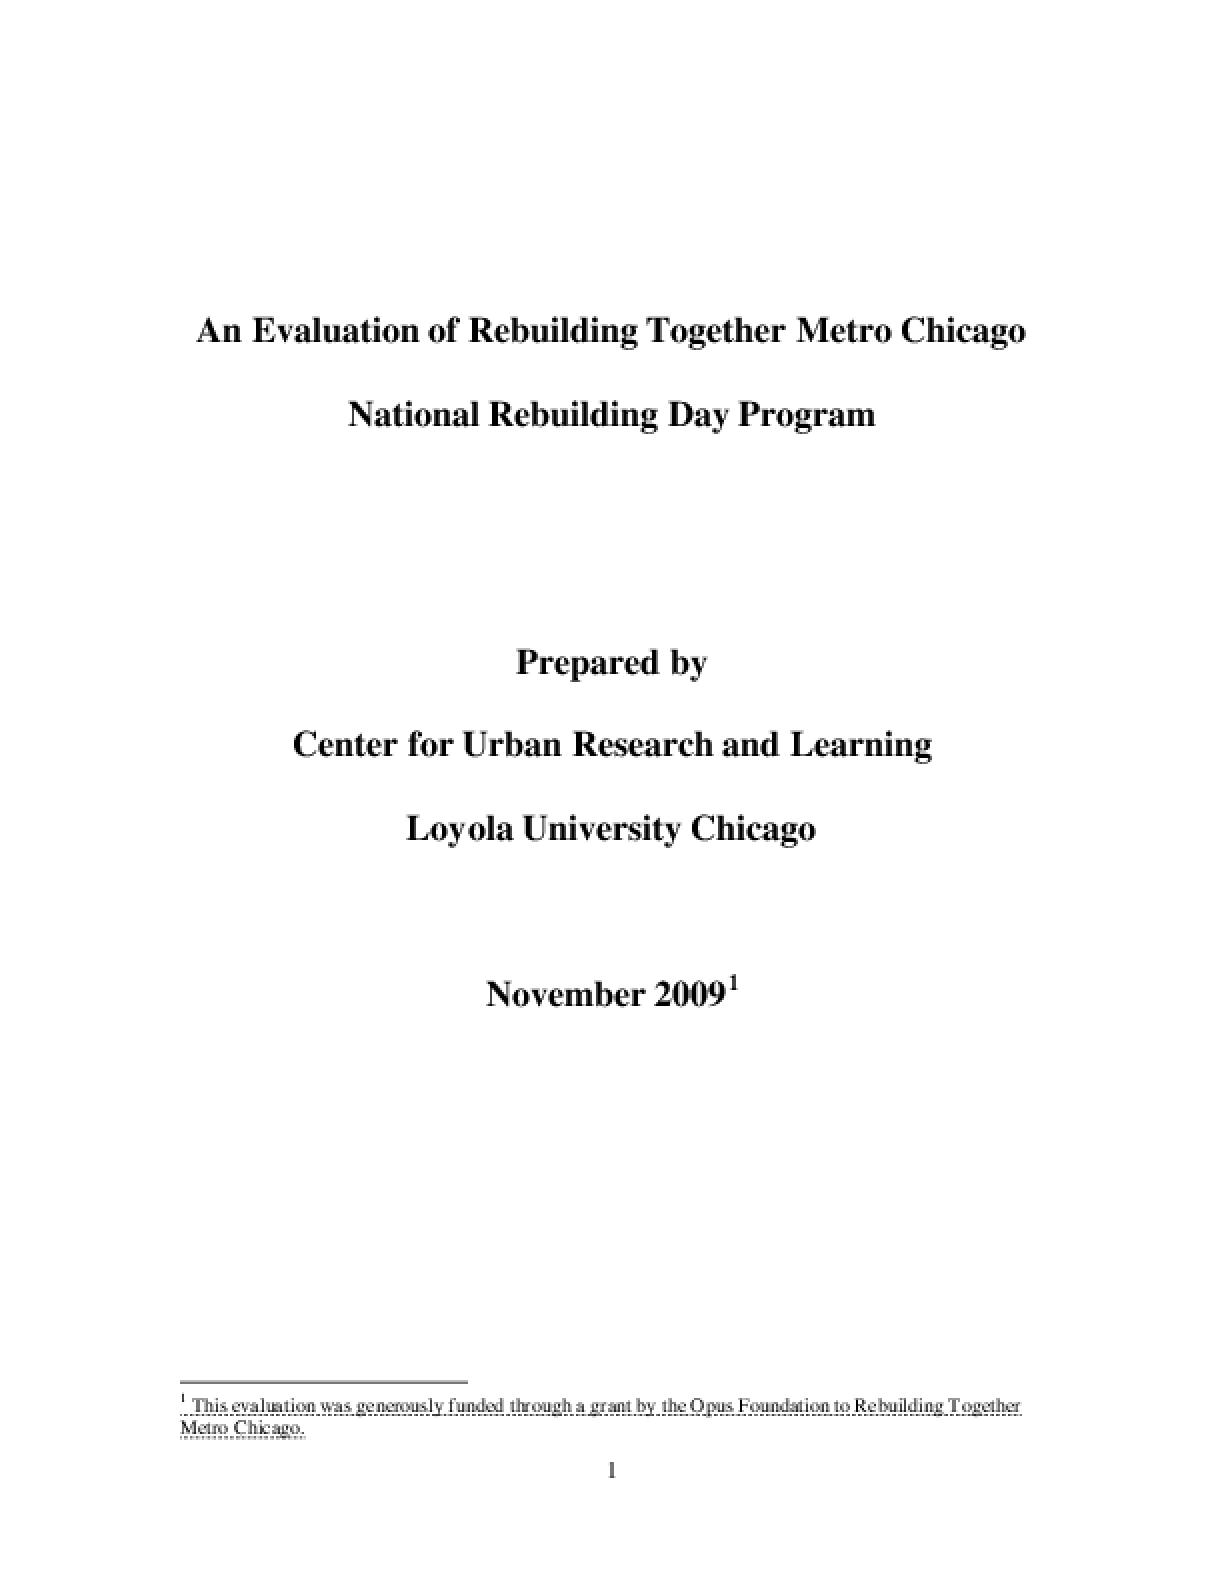 An Evaluation of Rebuilding Together Metro Chicago National Rebuilding Day Program